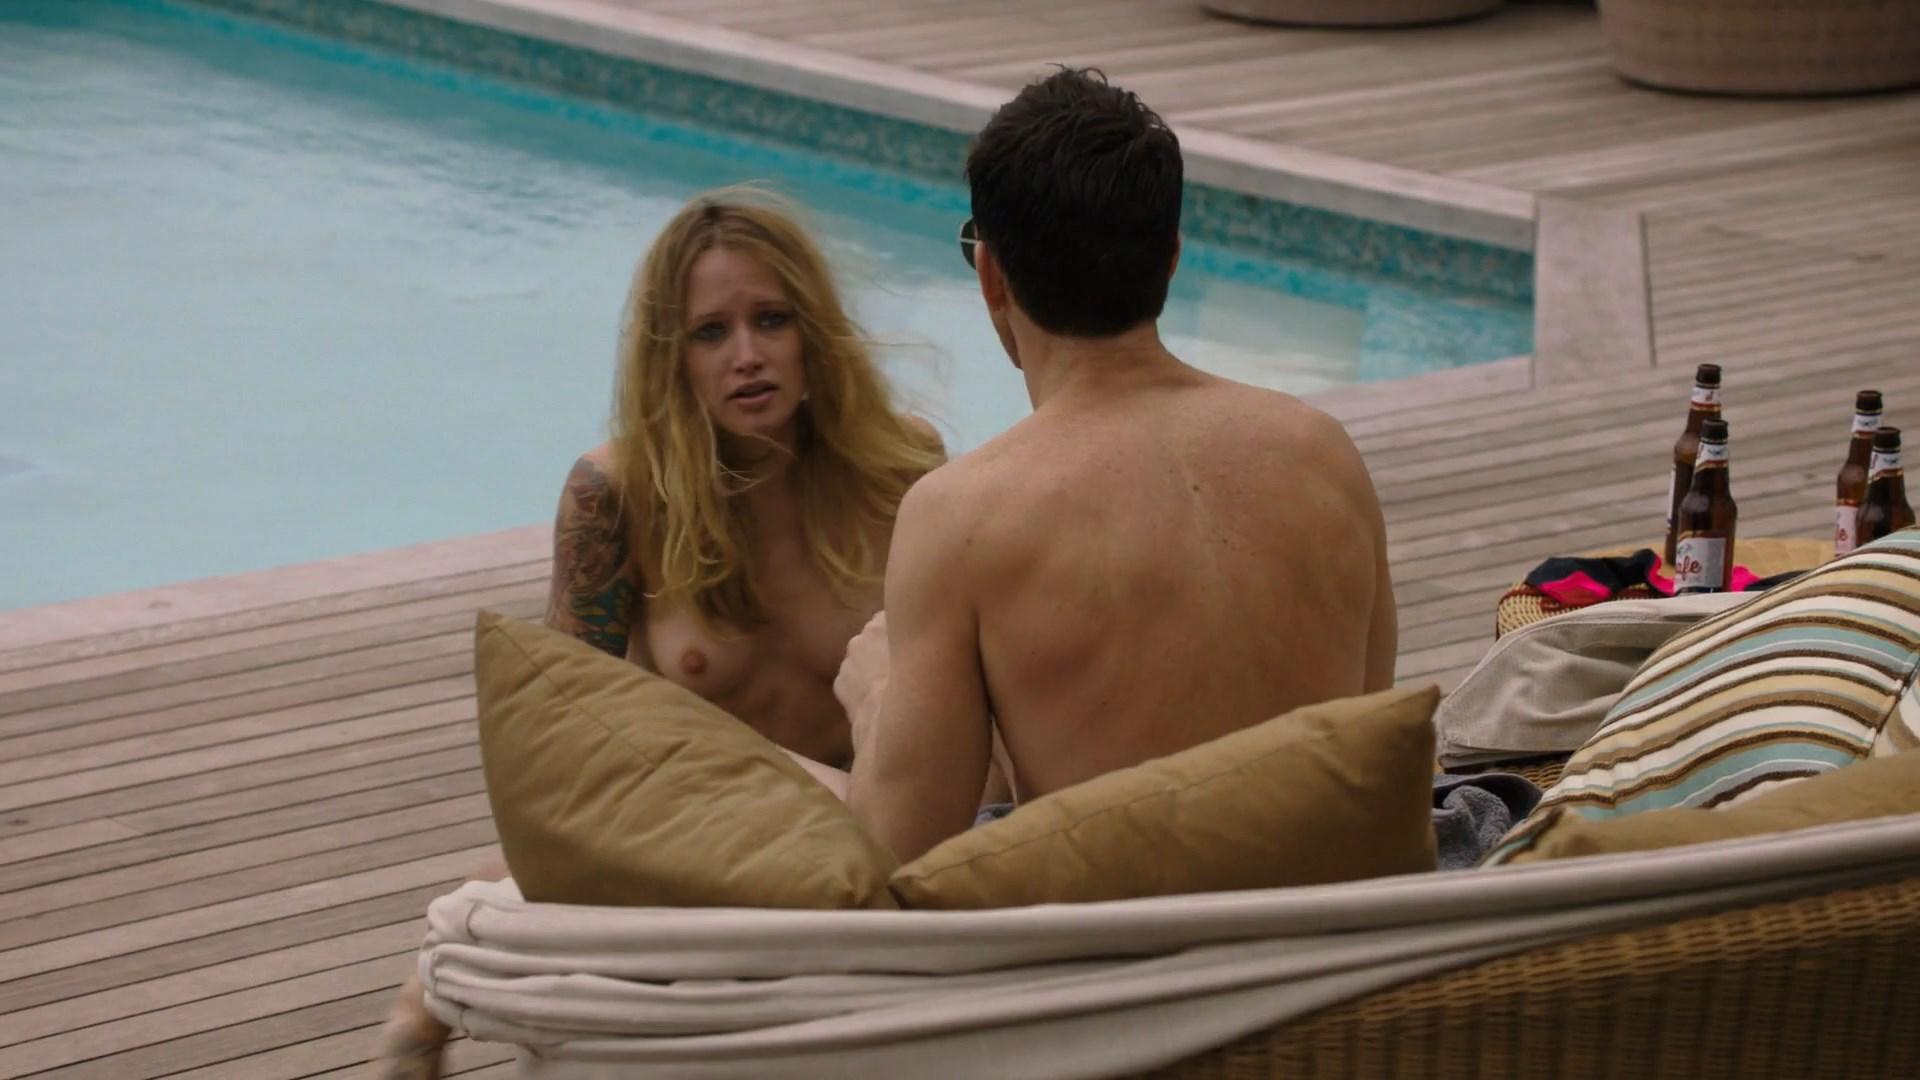 Elisa meliani nude sexy,Amanda seyfried nude fappening 27 Photos Hot movies Ashley Madekwe Sexy -,Danai Gurira Sexy